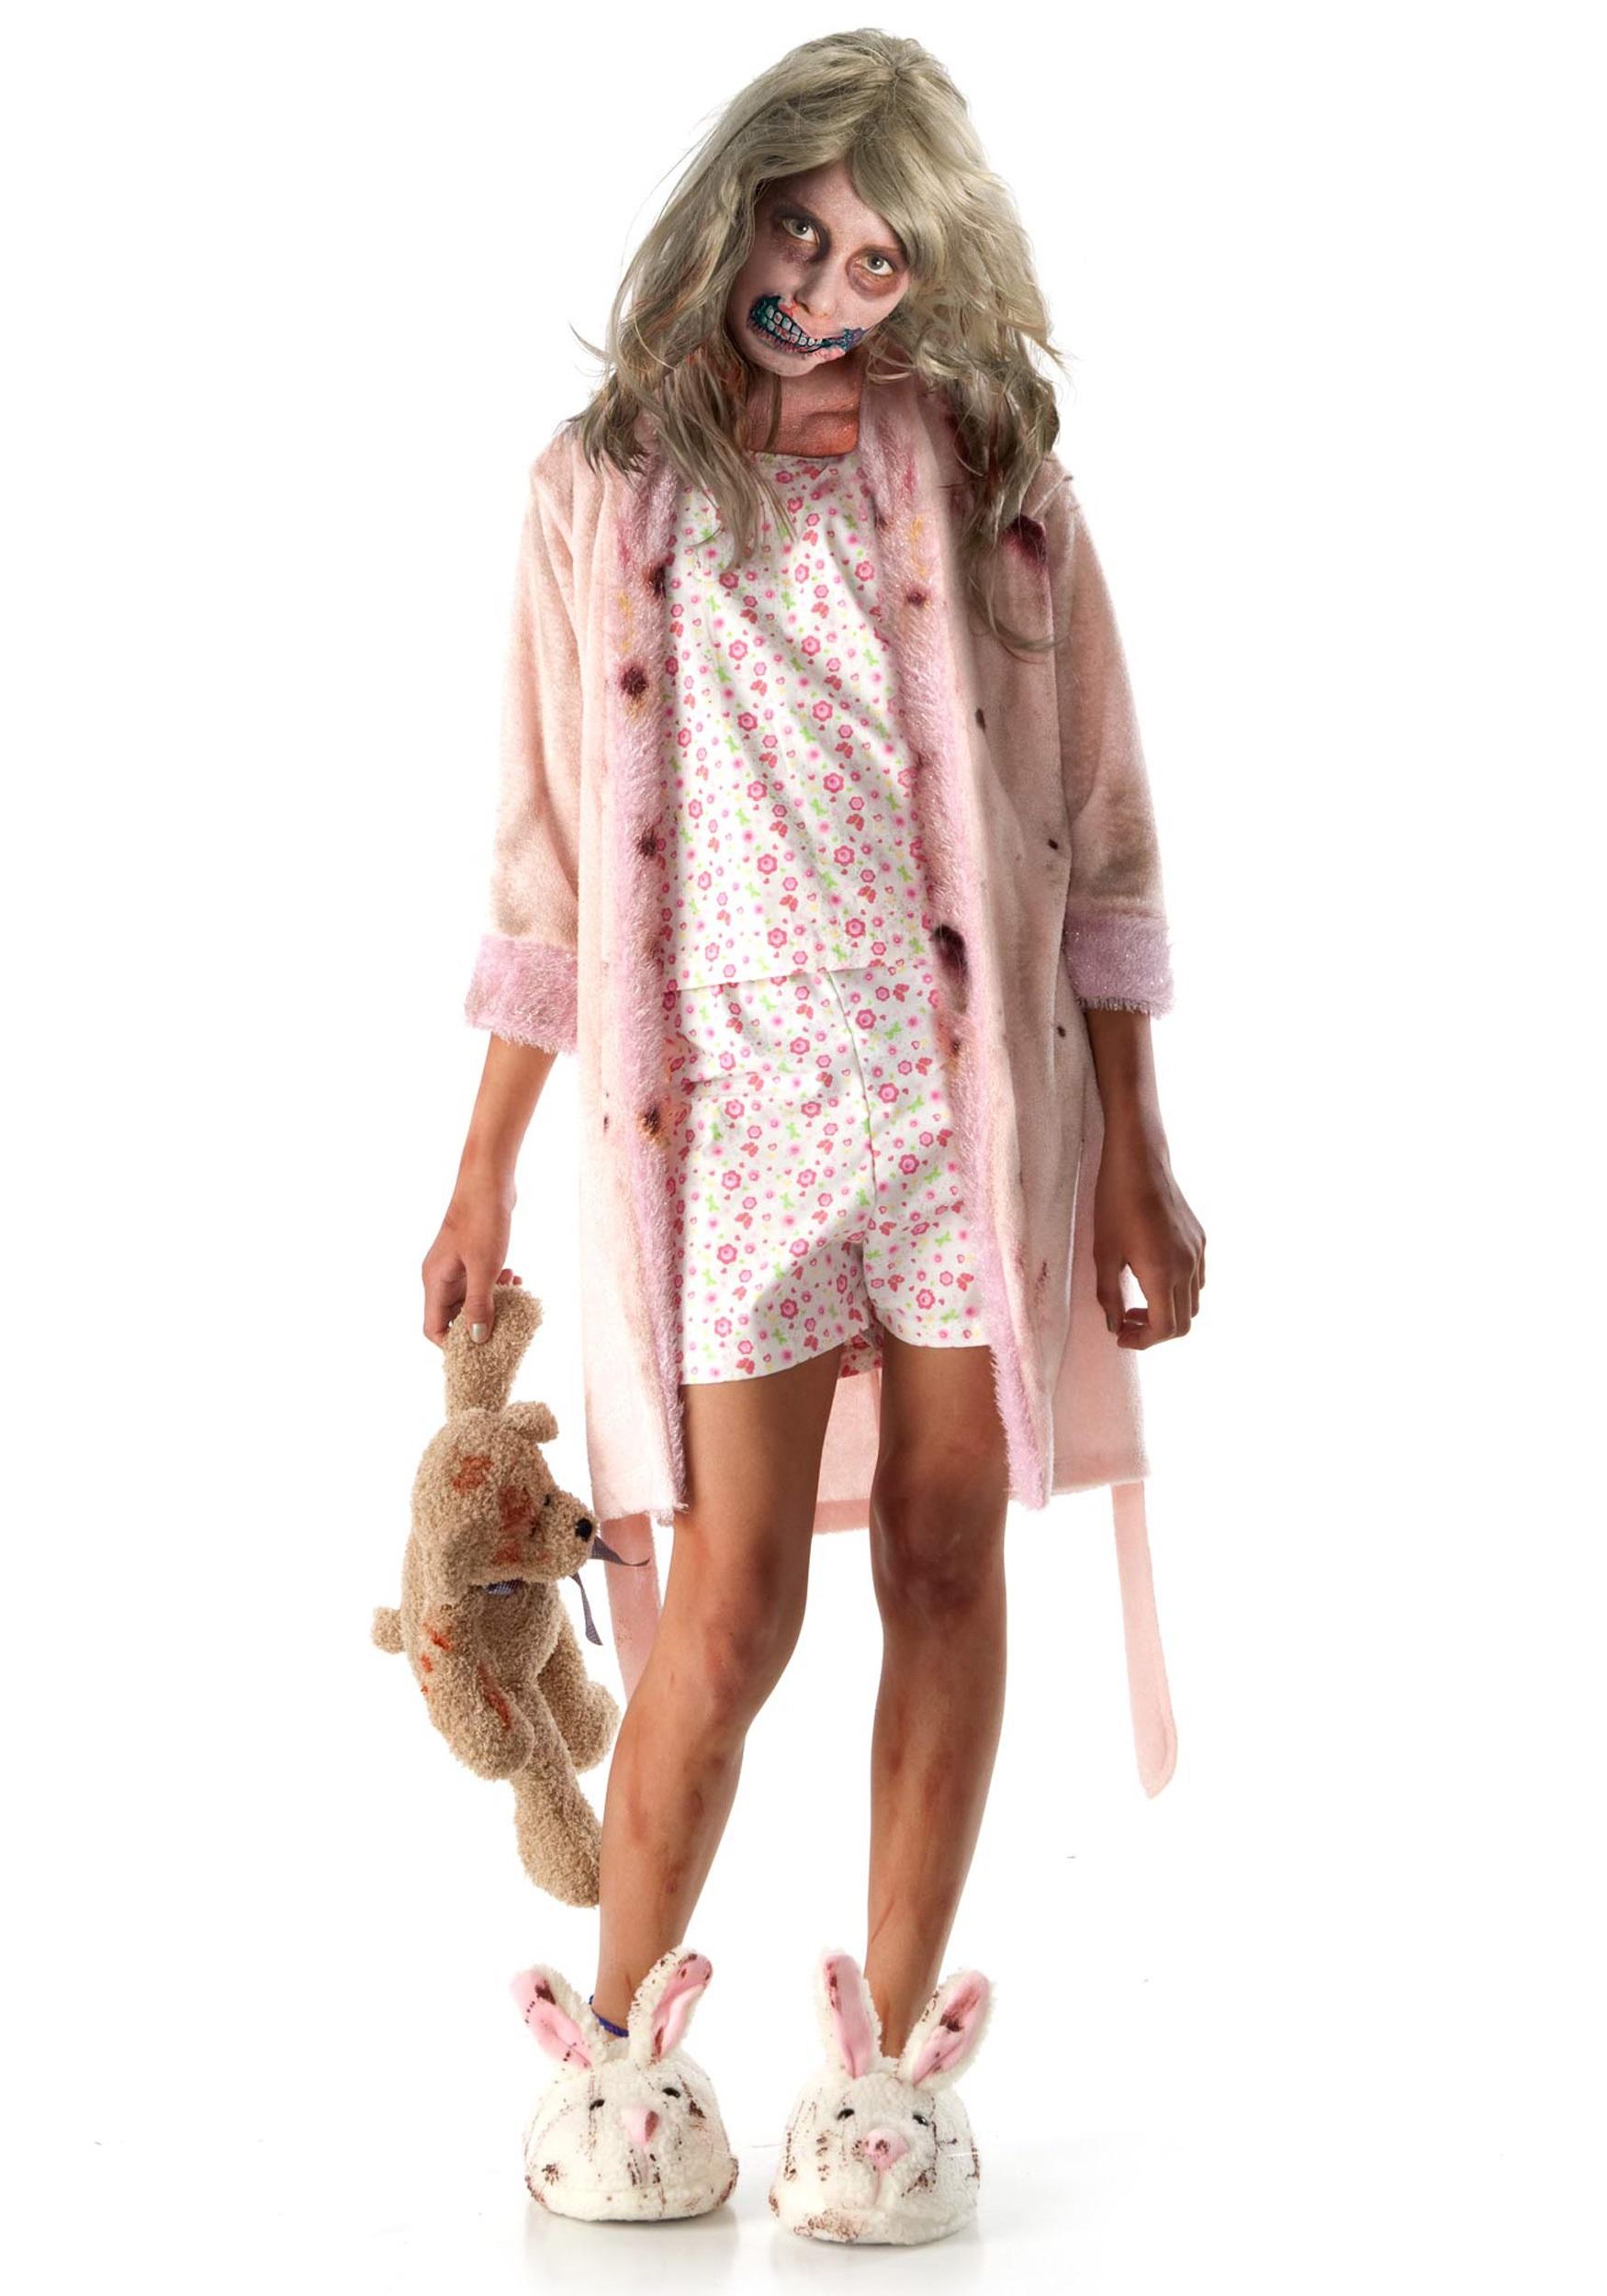 Child Little Girl Zombie Costume